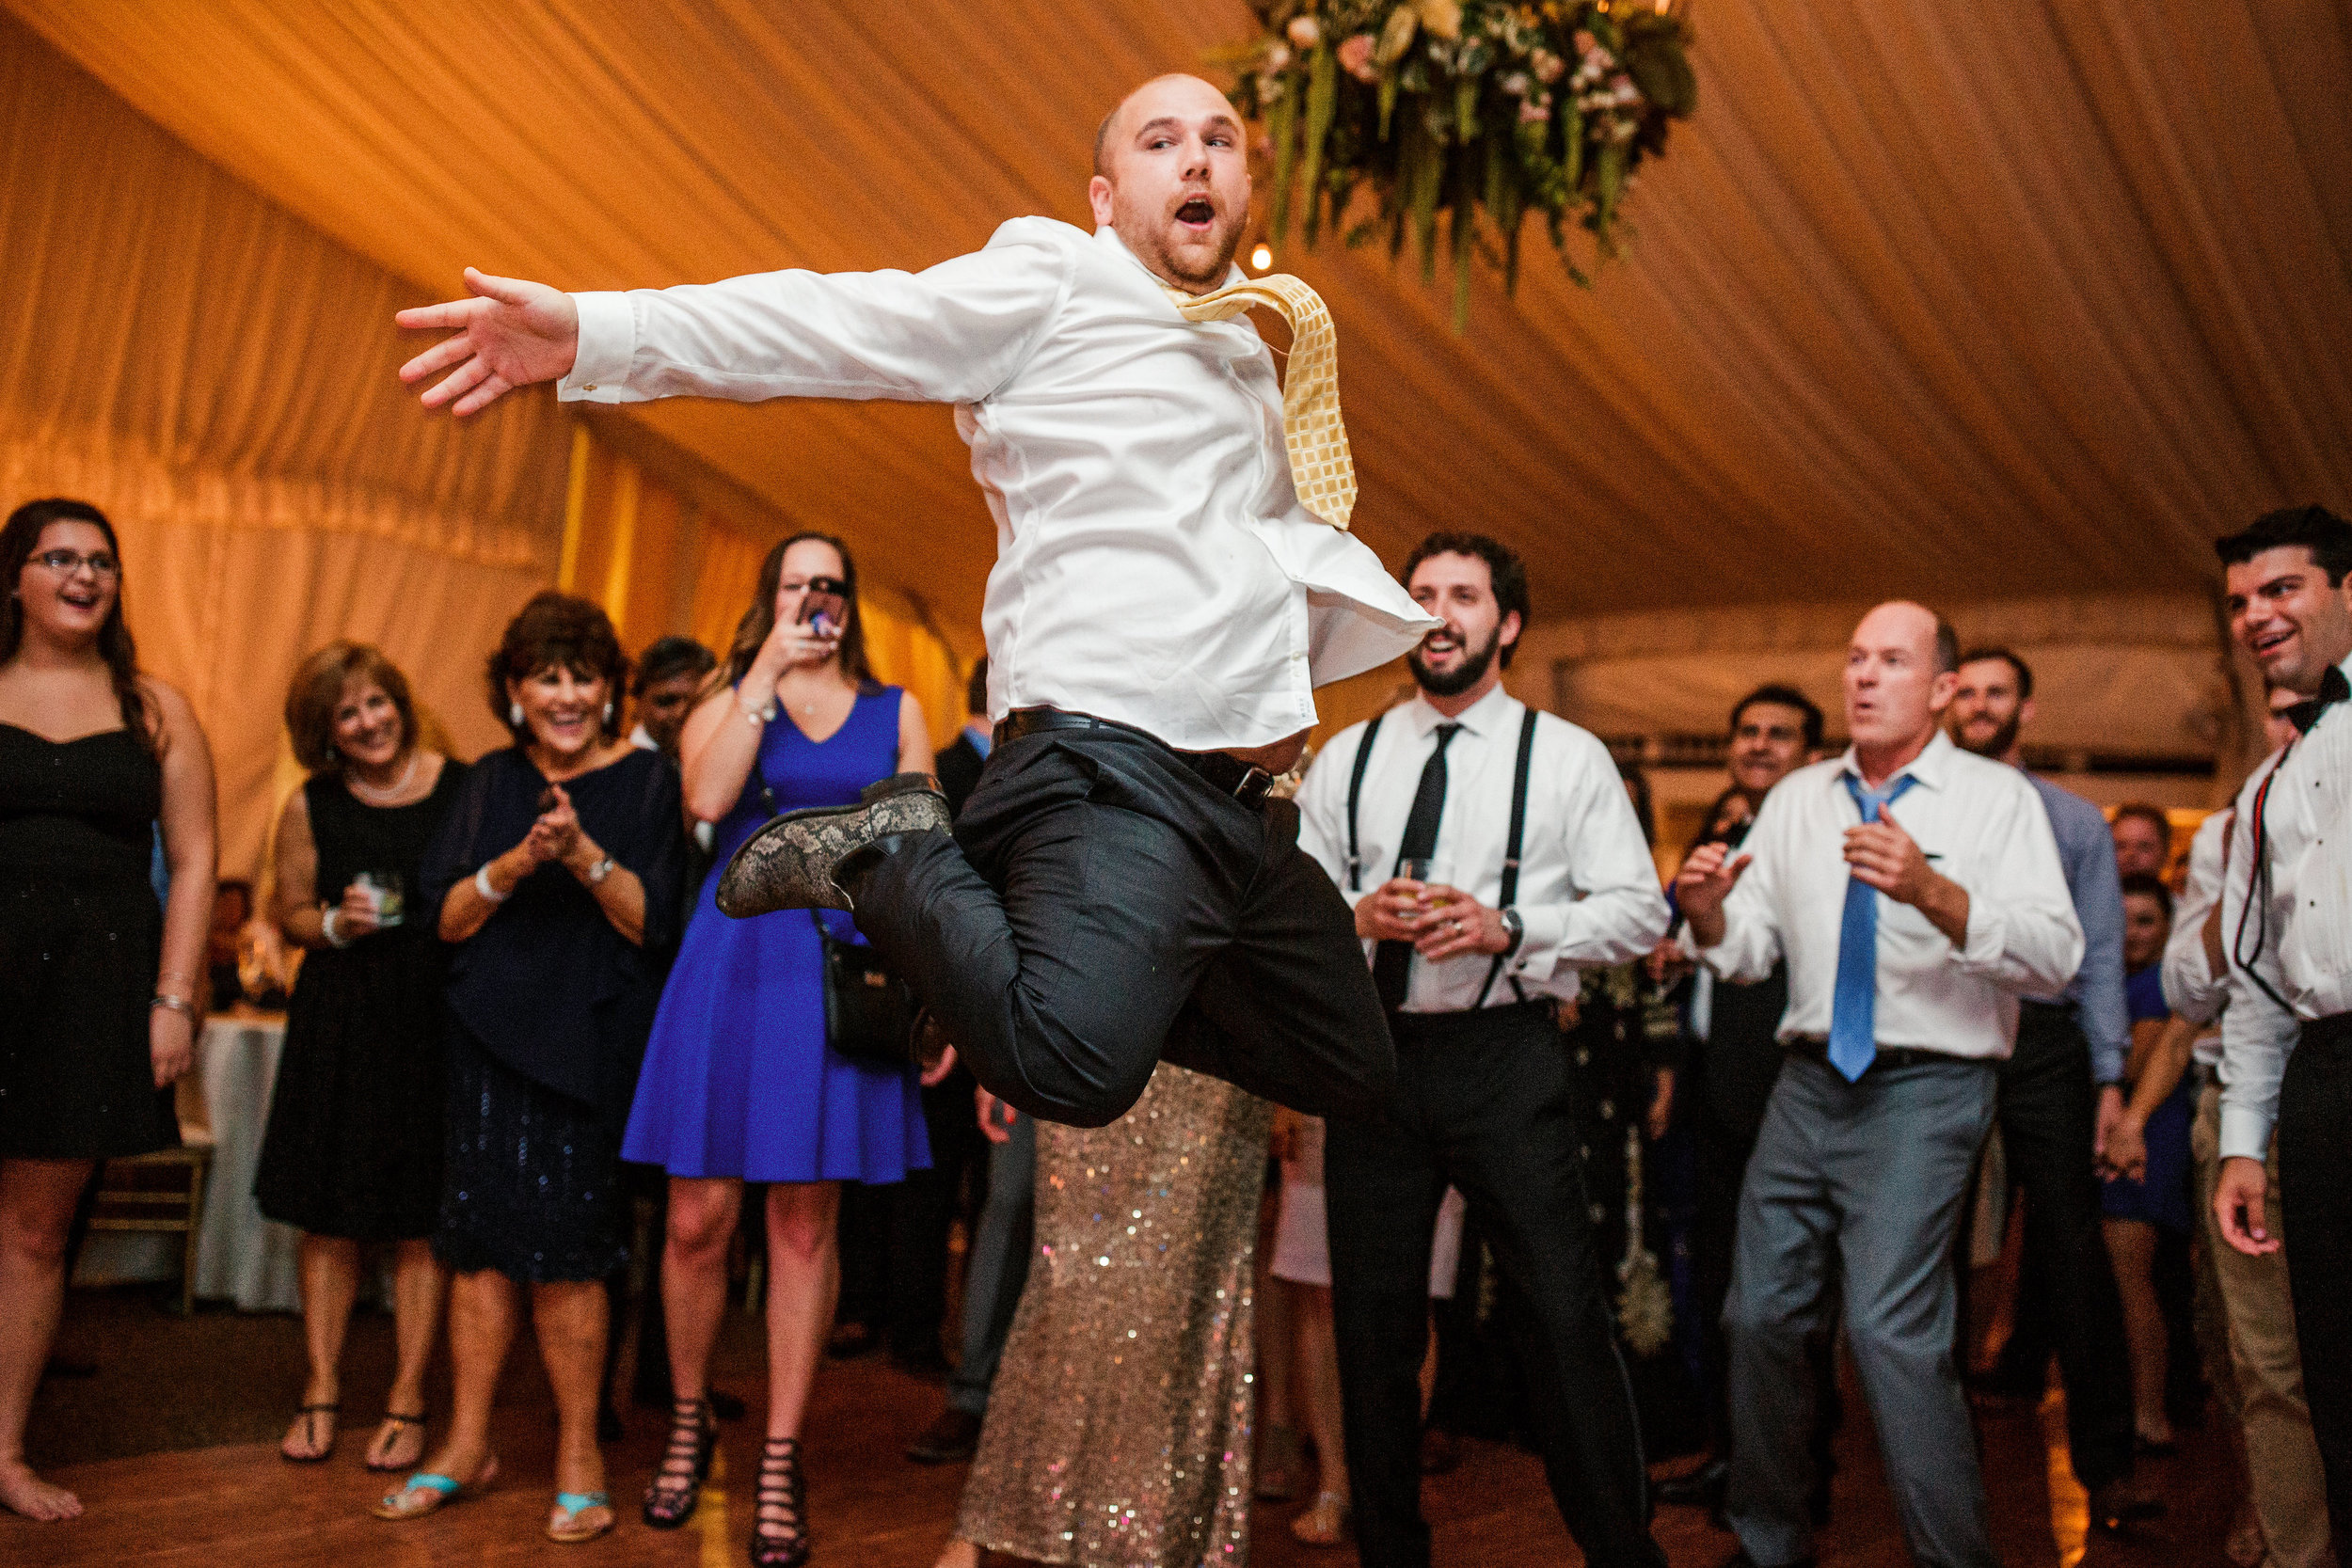 Riverwood-Mansion-Wedding44.jpg